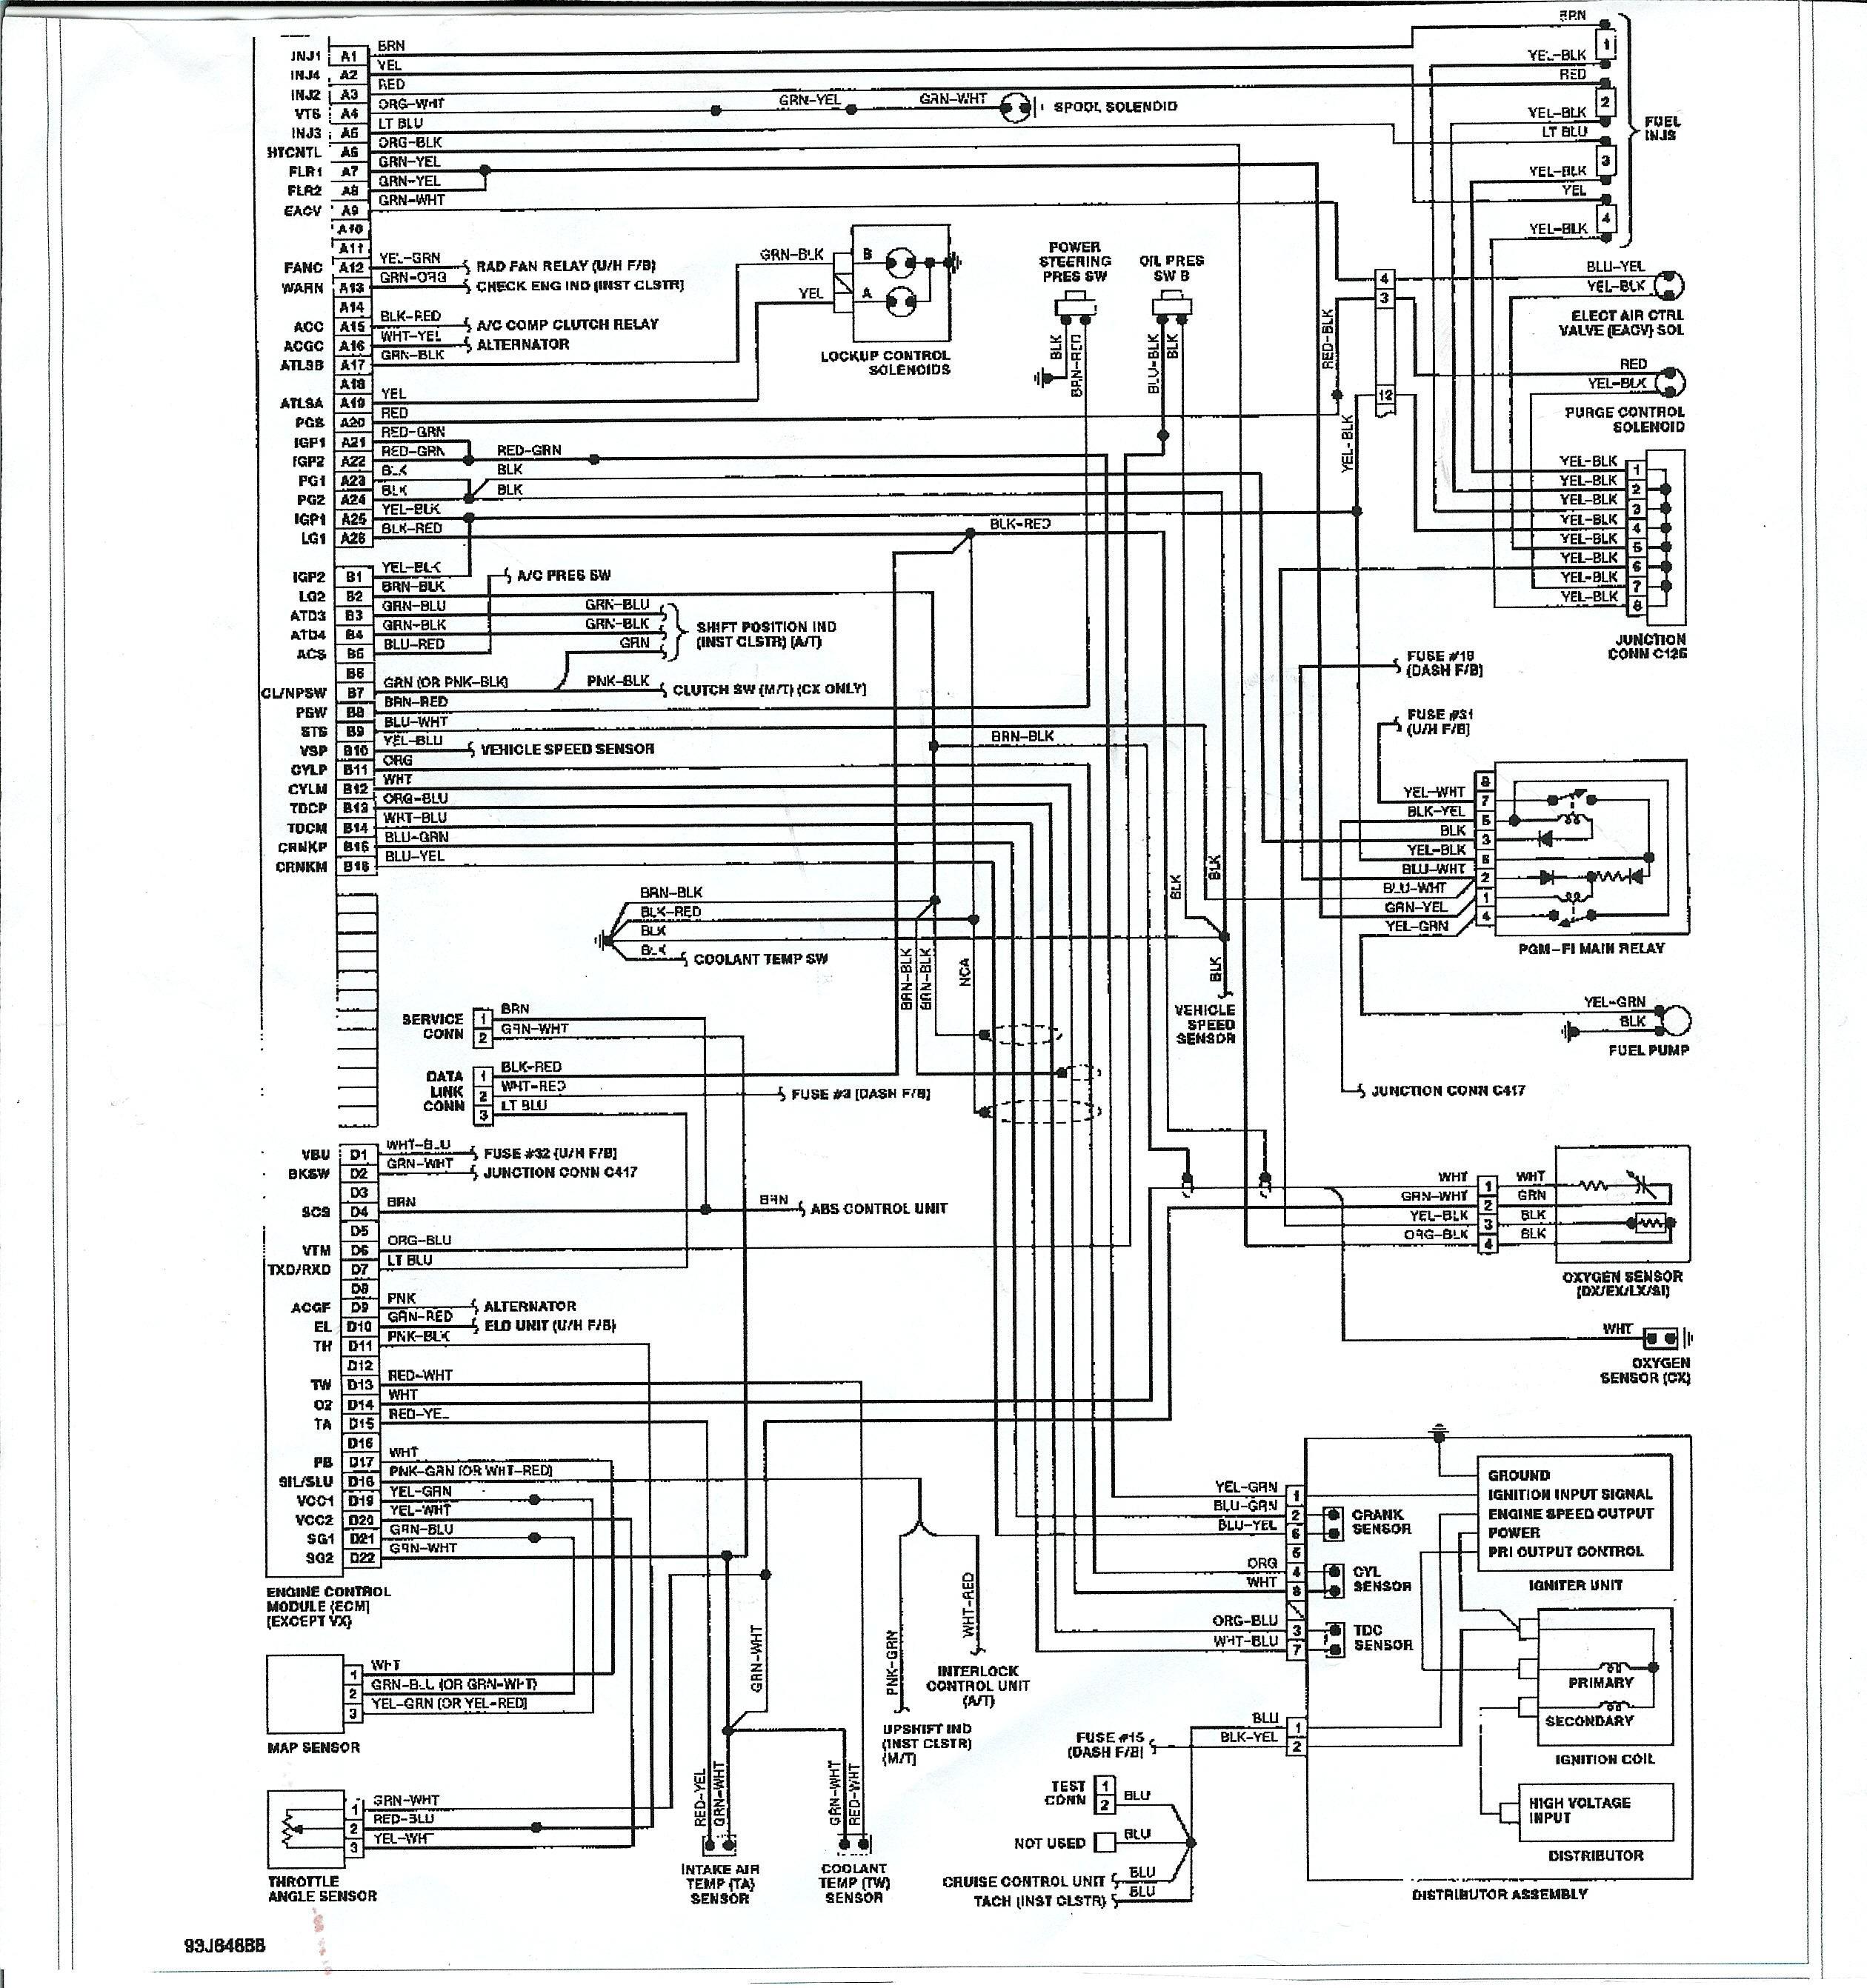 2000 Honda Civic Engine Diagram 2000 Honda Accord Engine Diagram Vw Transporter Wiring Diagram 95 Of 2000 Honda Civic Engine Diagram